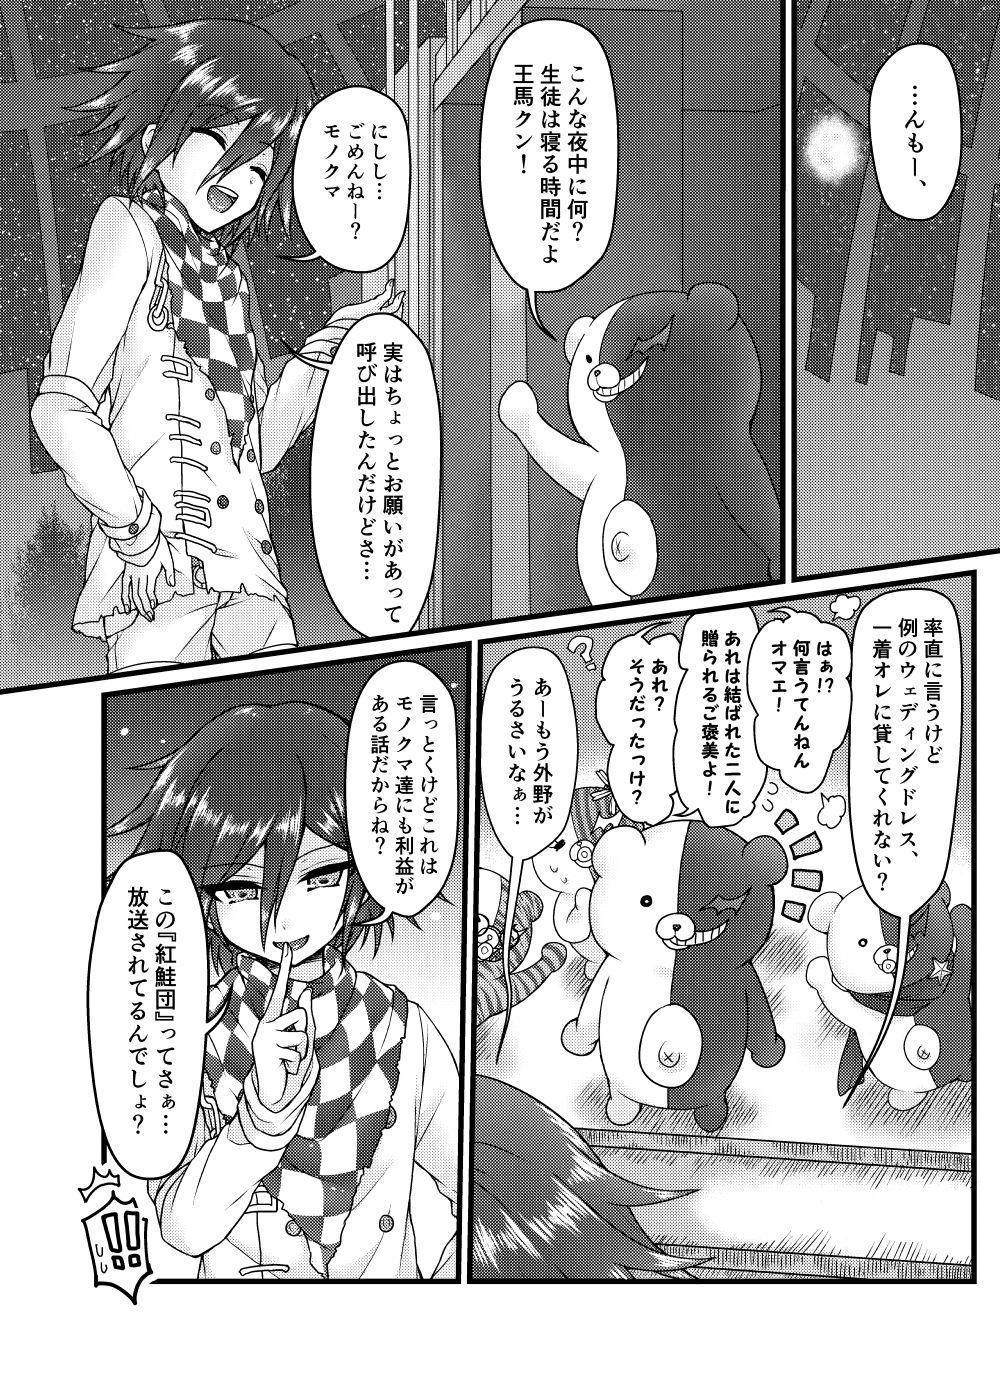 Usotsuki Hanayome 10